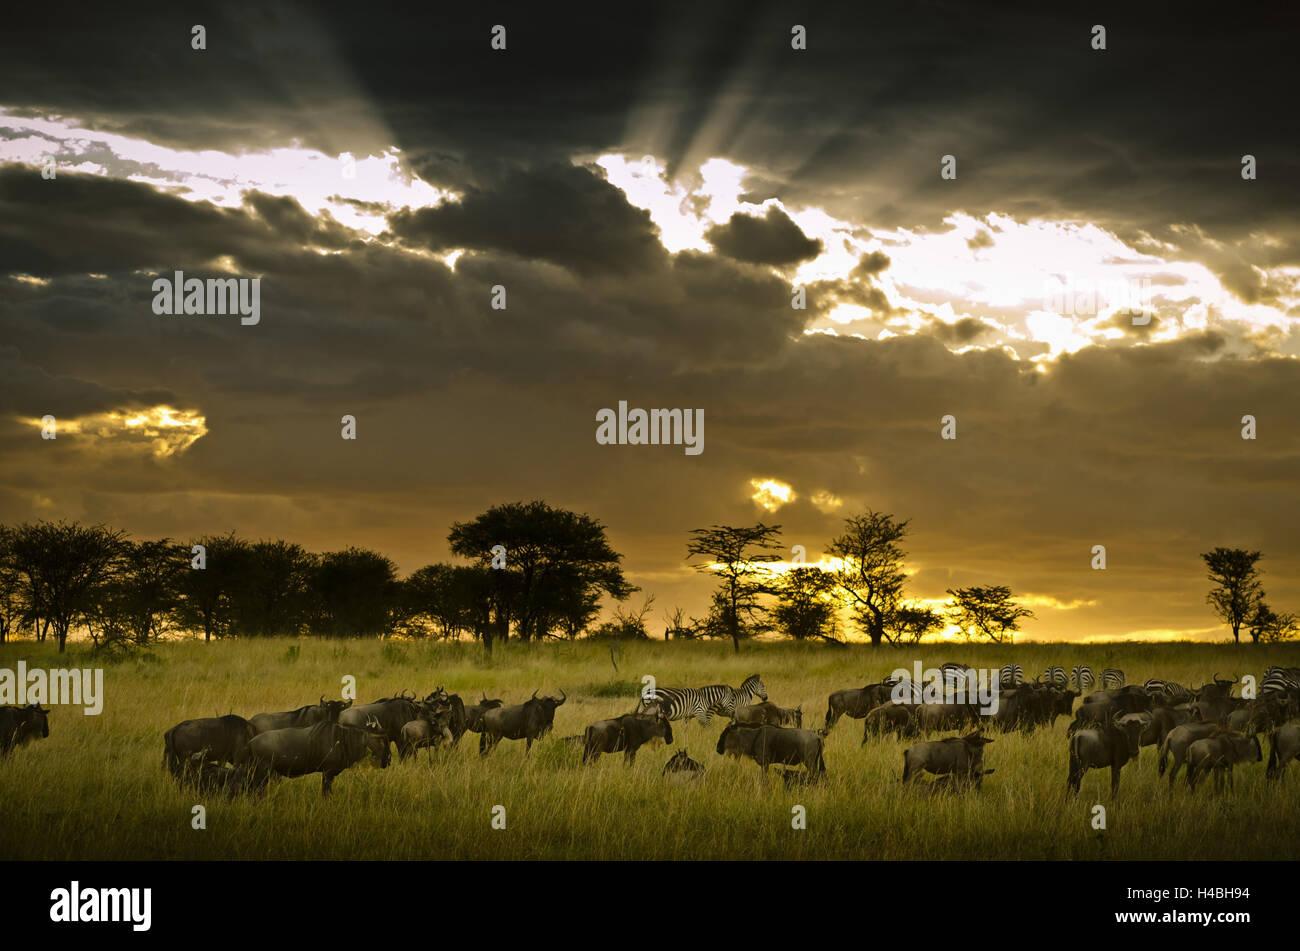 Afrika, Ostafrika, Tansania, Serengeti, Tierwelt, Gnus, Zebras, Stockbild